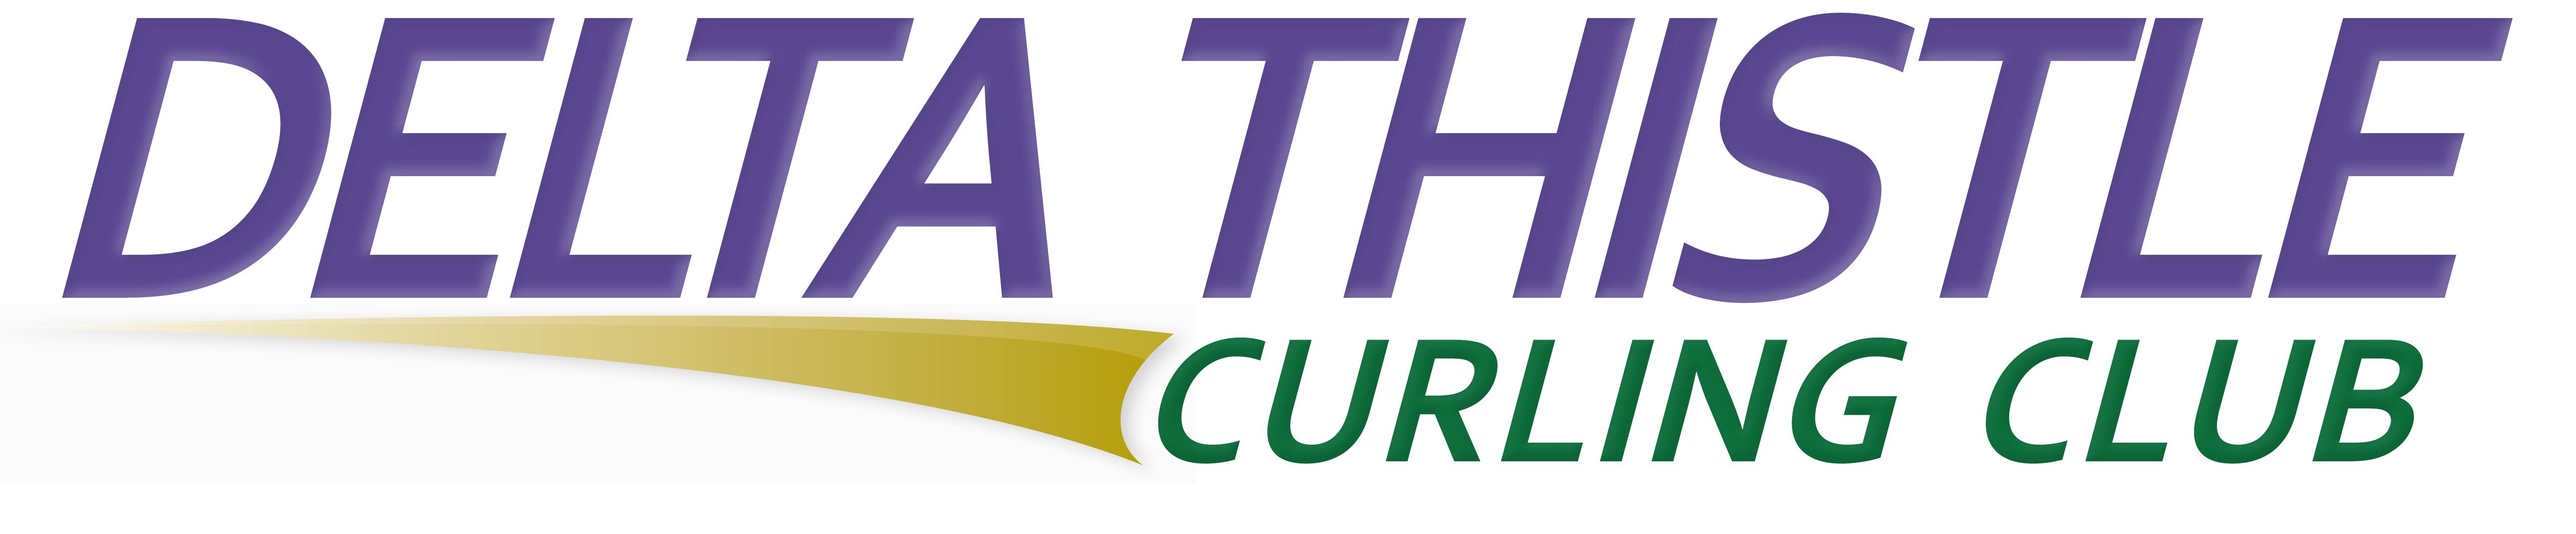 Logo   delta thistle curling club